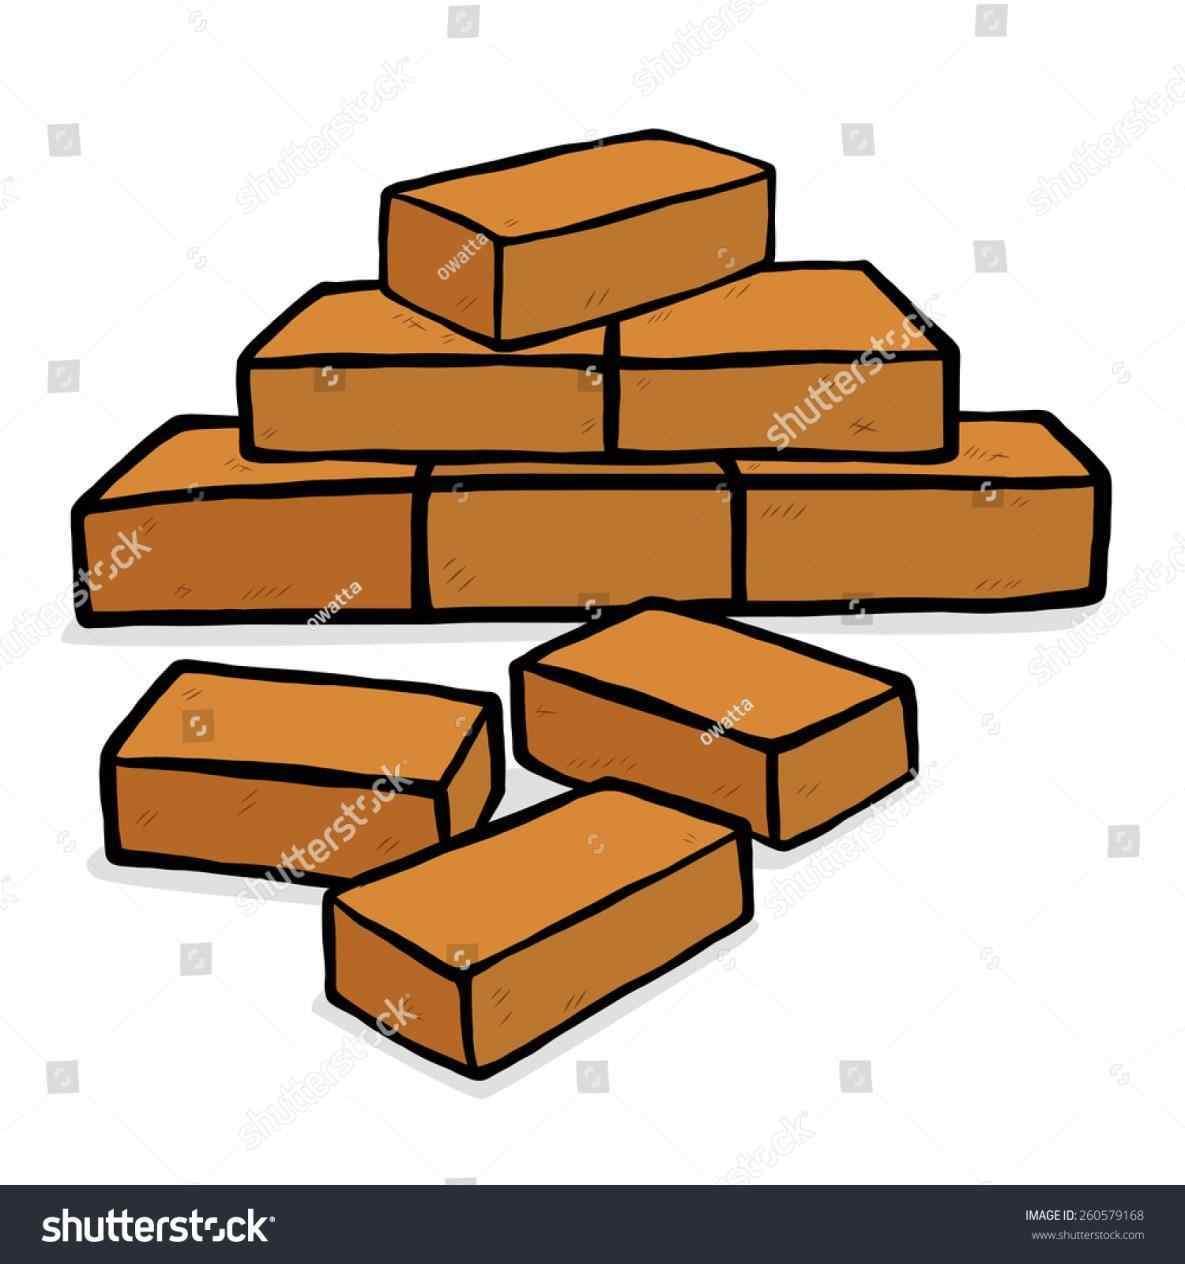 clip download Brick clipart.  clipartlook